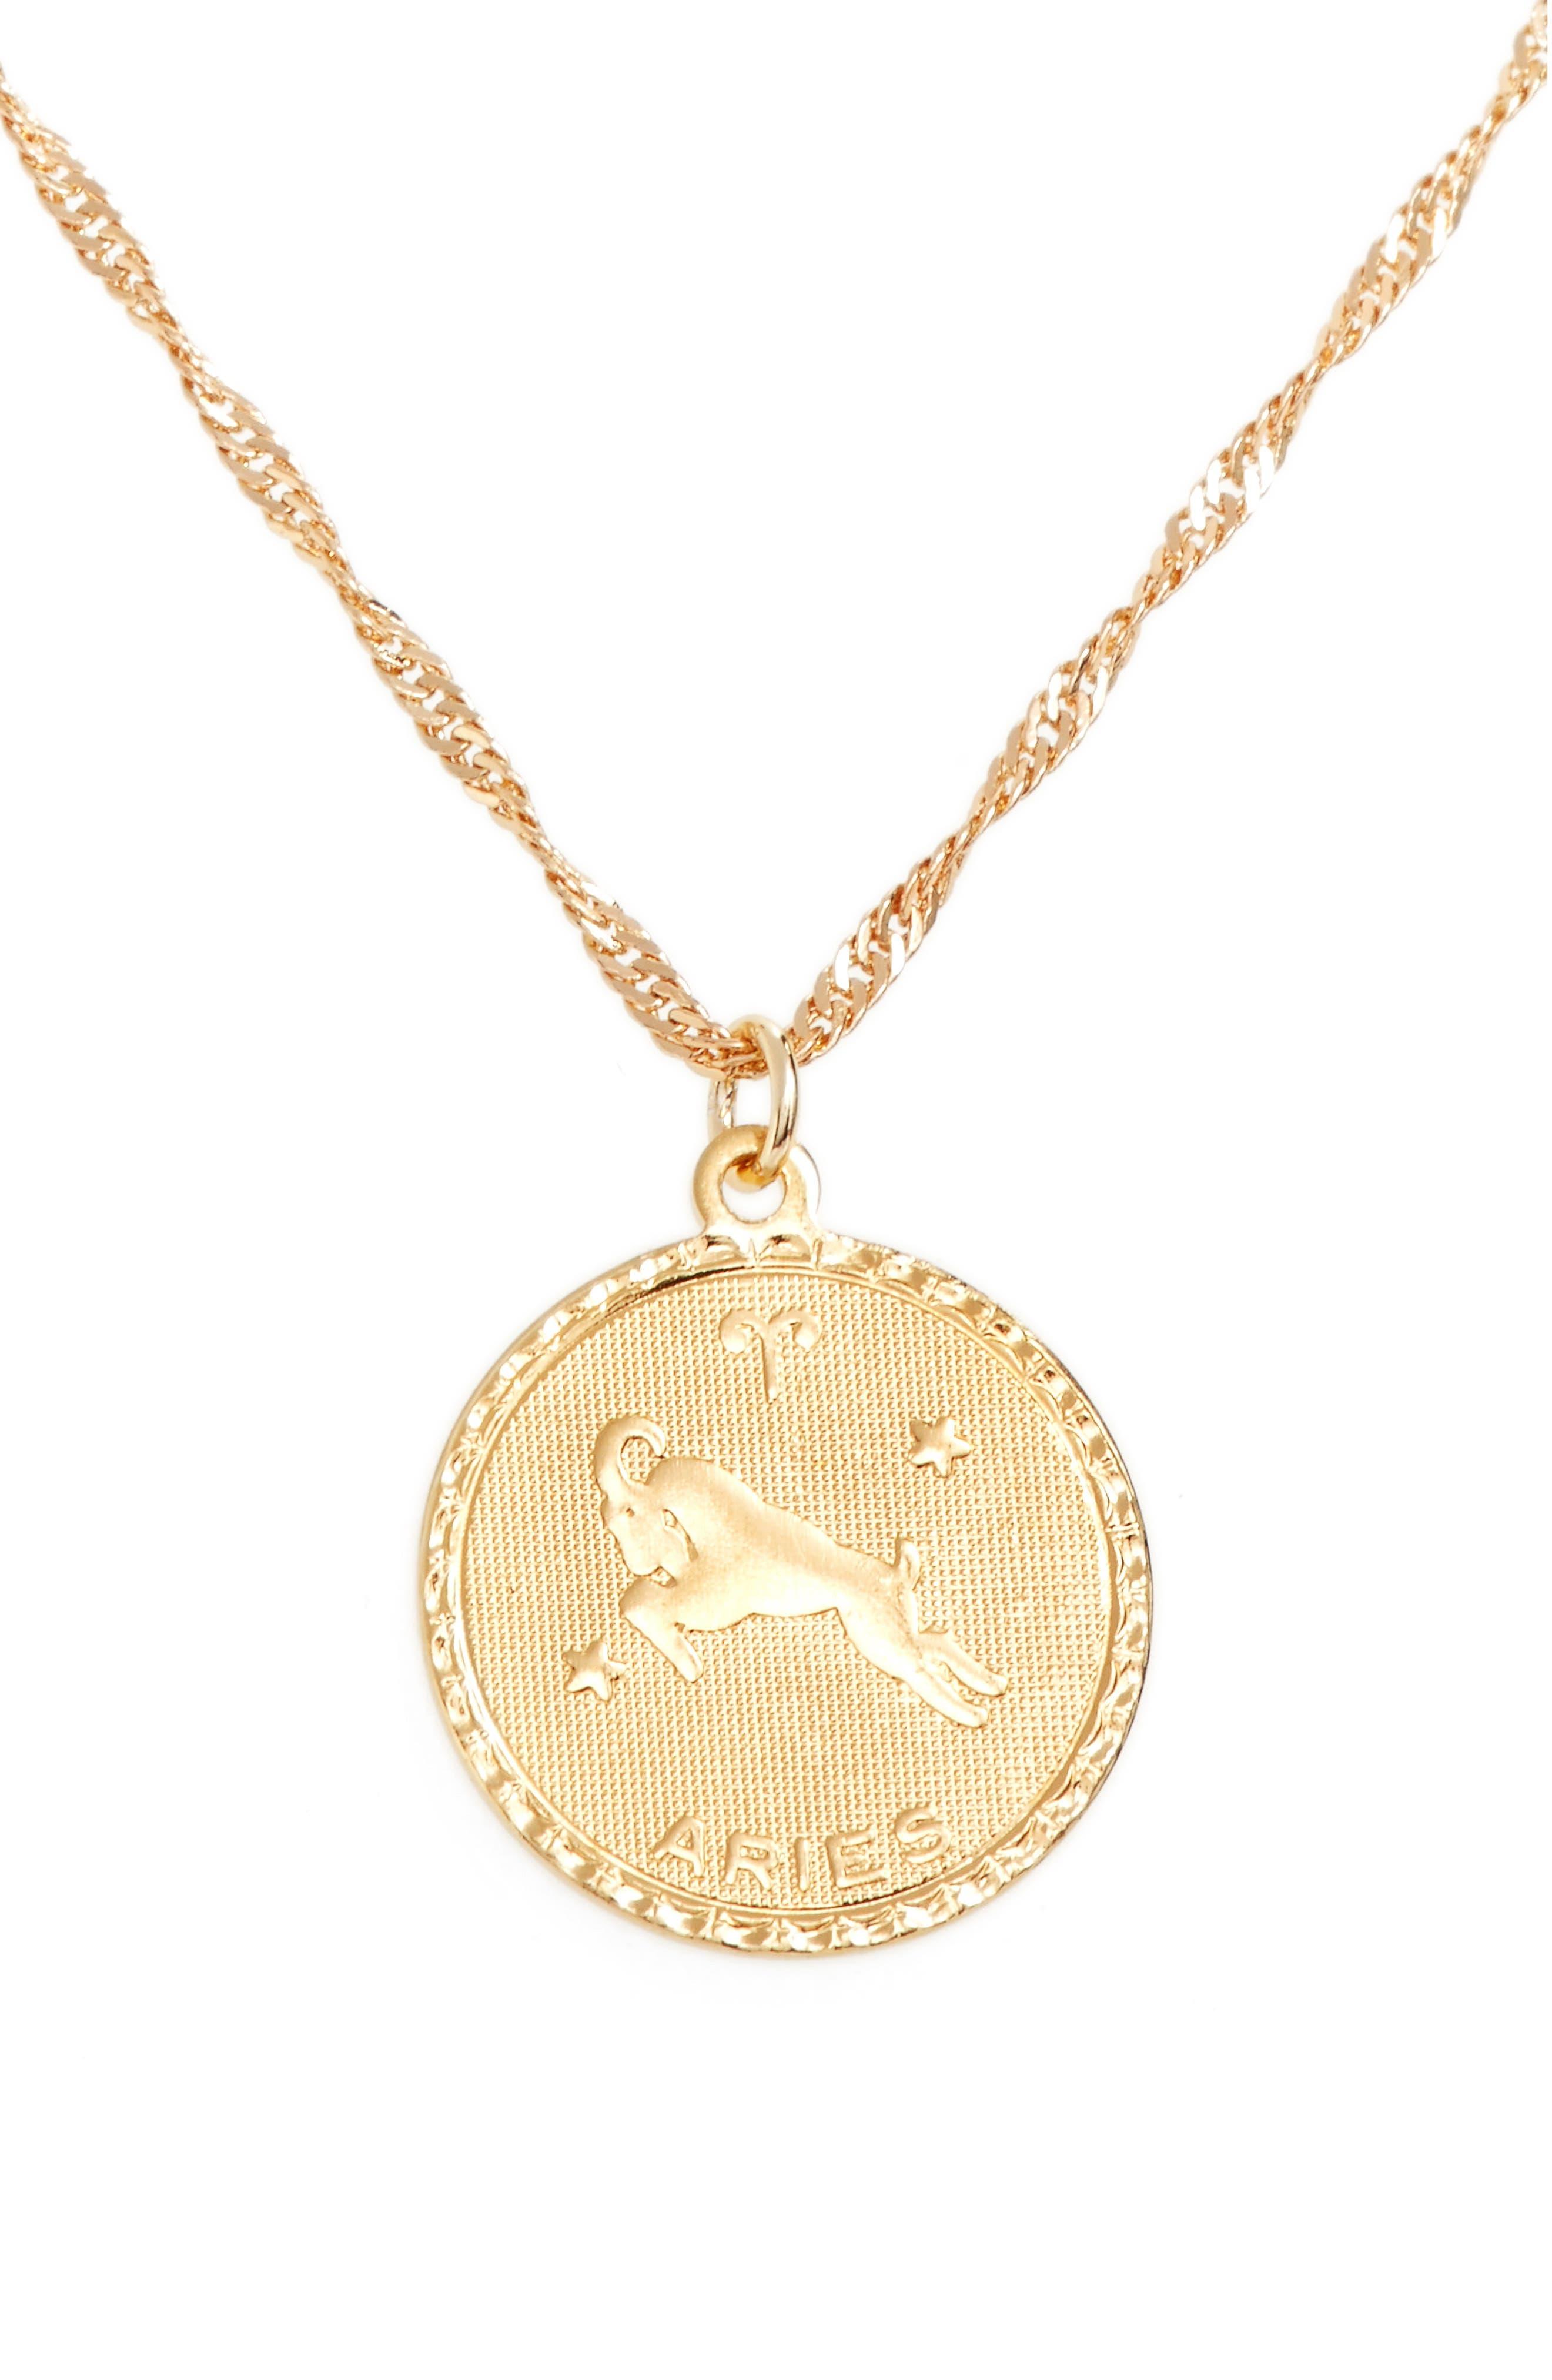 Ascending Aries Pendant Necklace,                             Main thumbnail 1, color,                             Yellow Gold